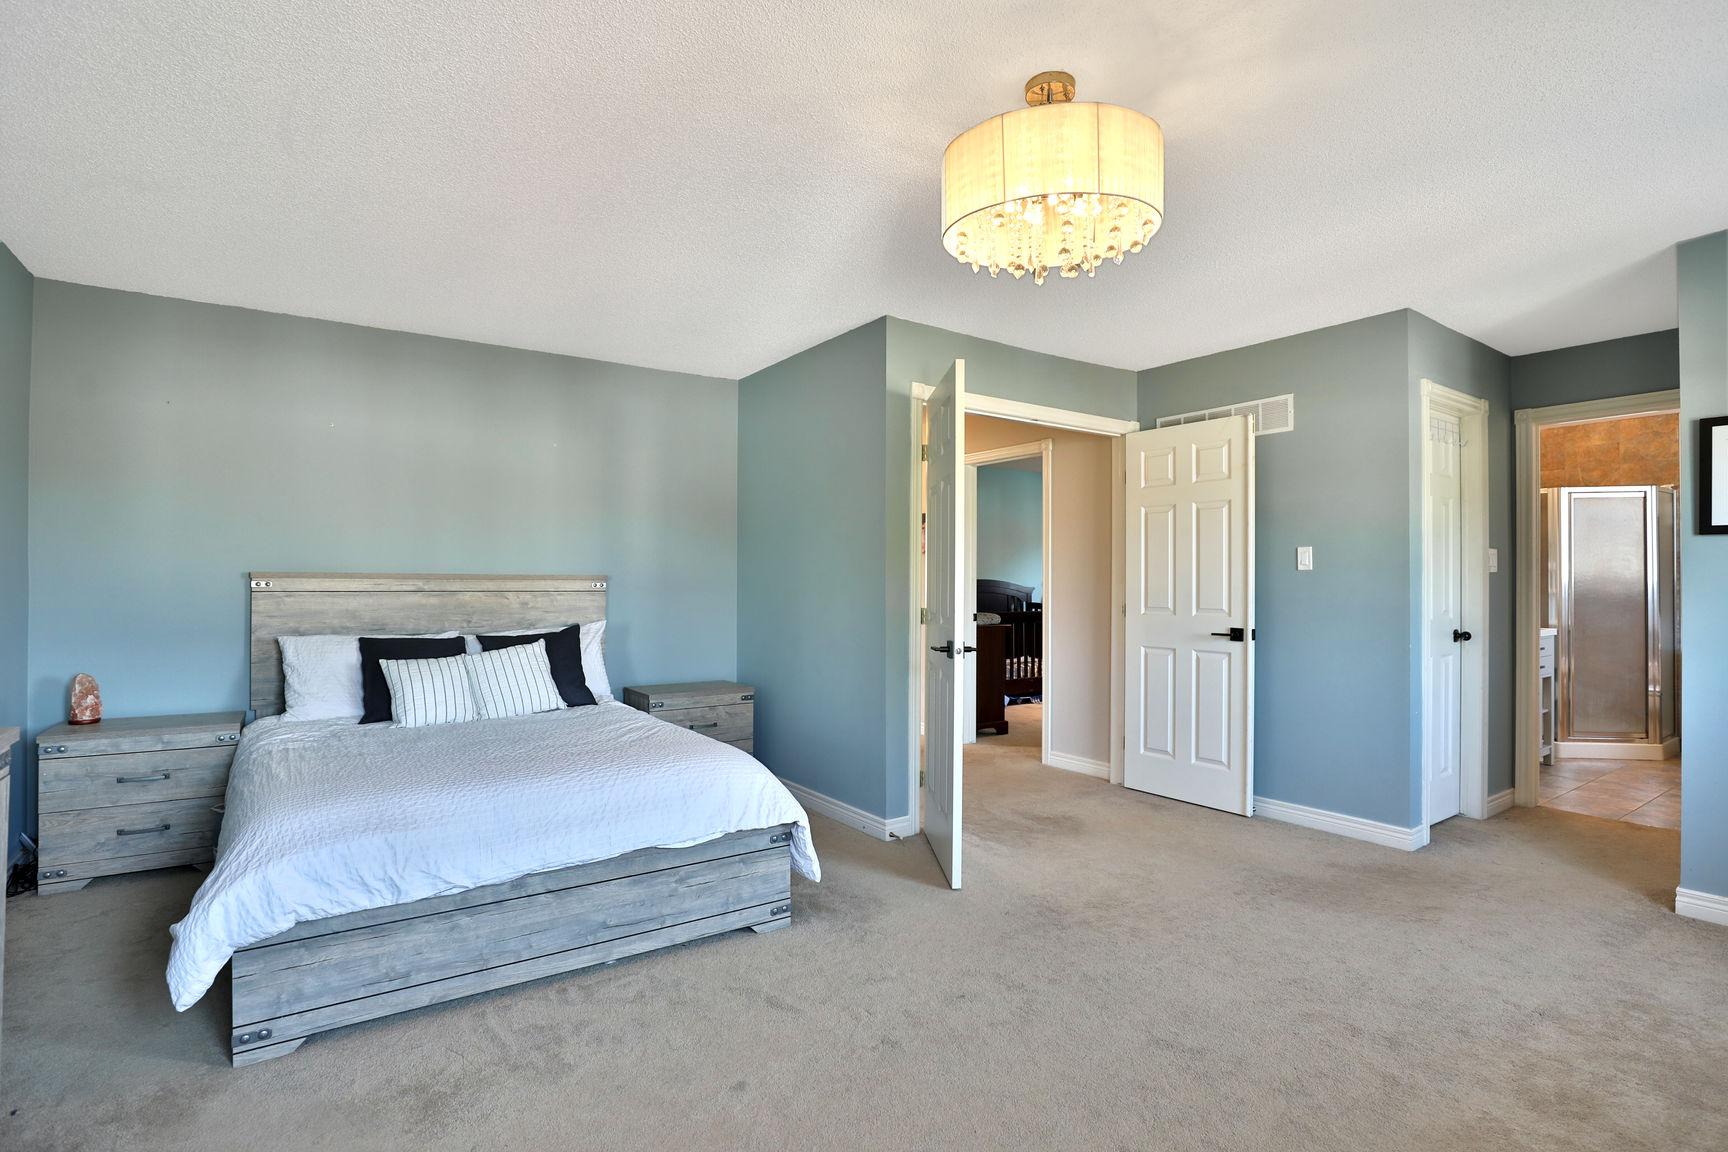 Glanbrook Binbrook 26 Switzer master bedroom 2 - Recently SOLD in Binbrook